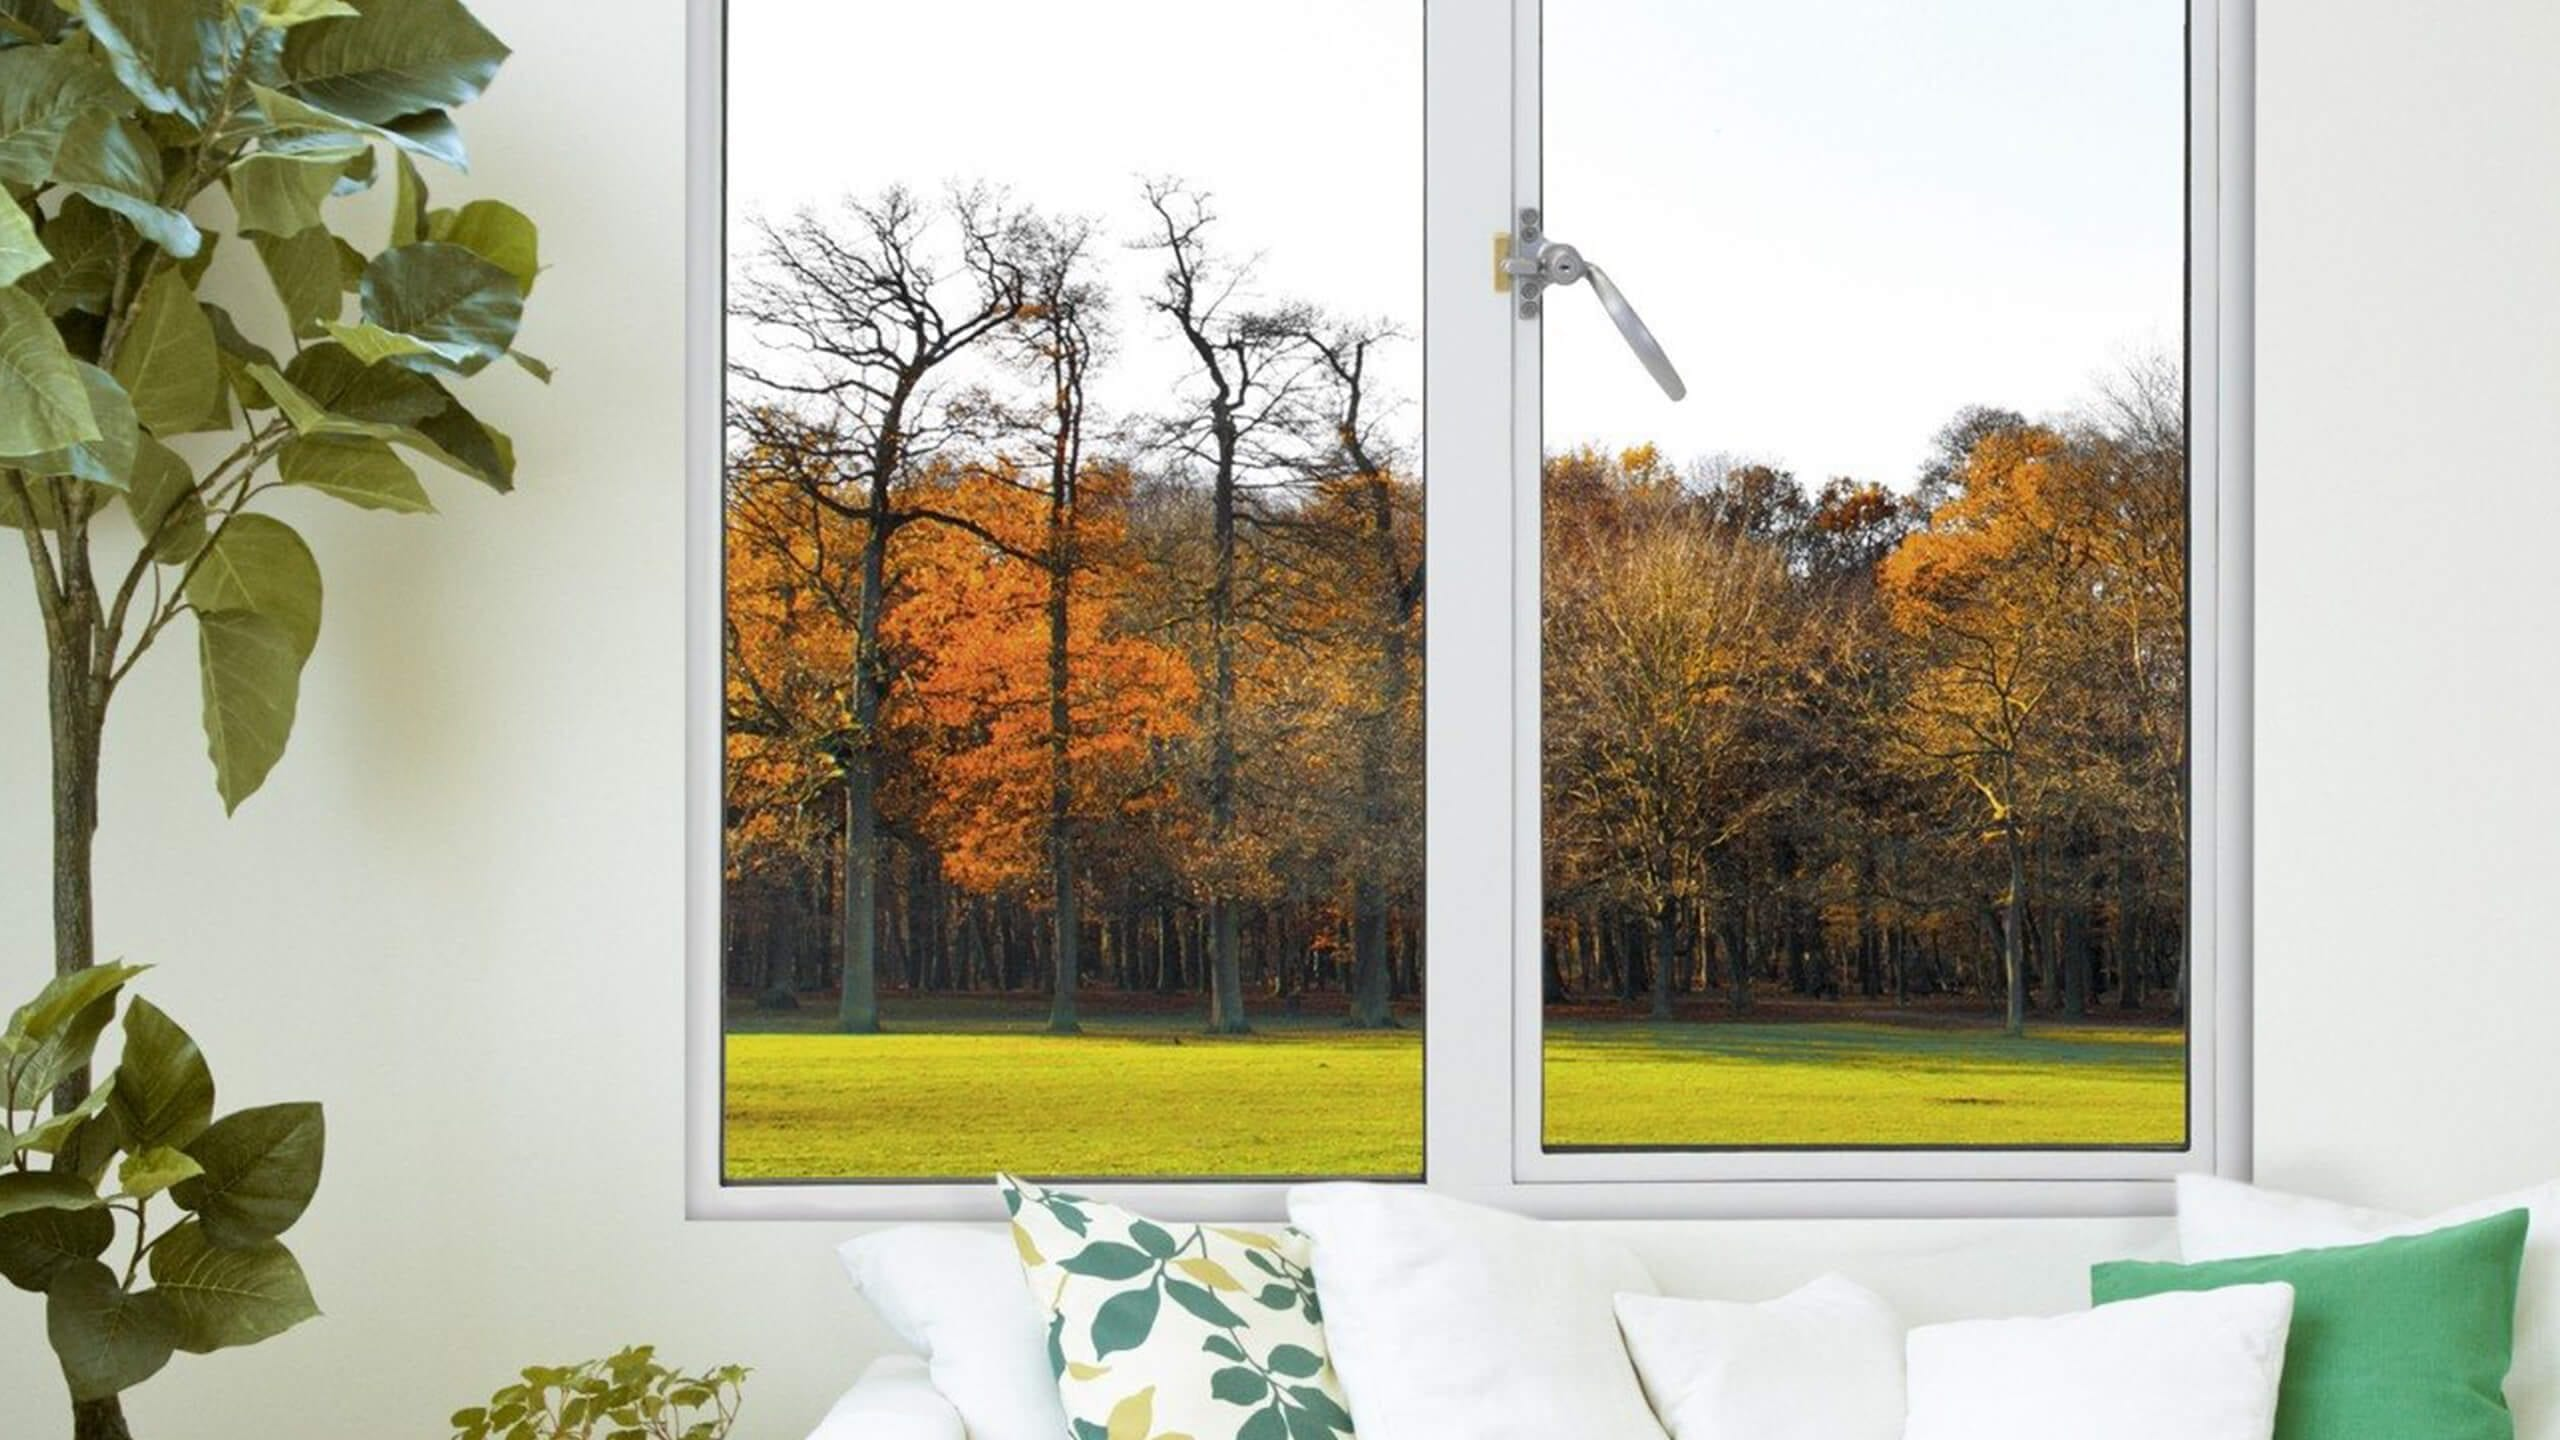 Crittall True As Steel – Crittall's New Homelightplus™ Enhanced Steel Window Image